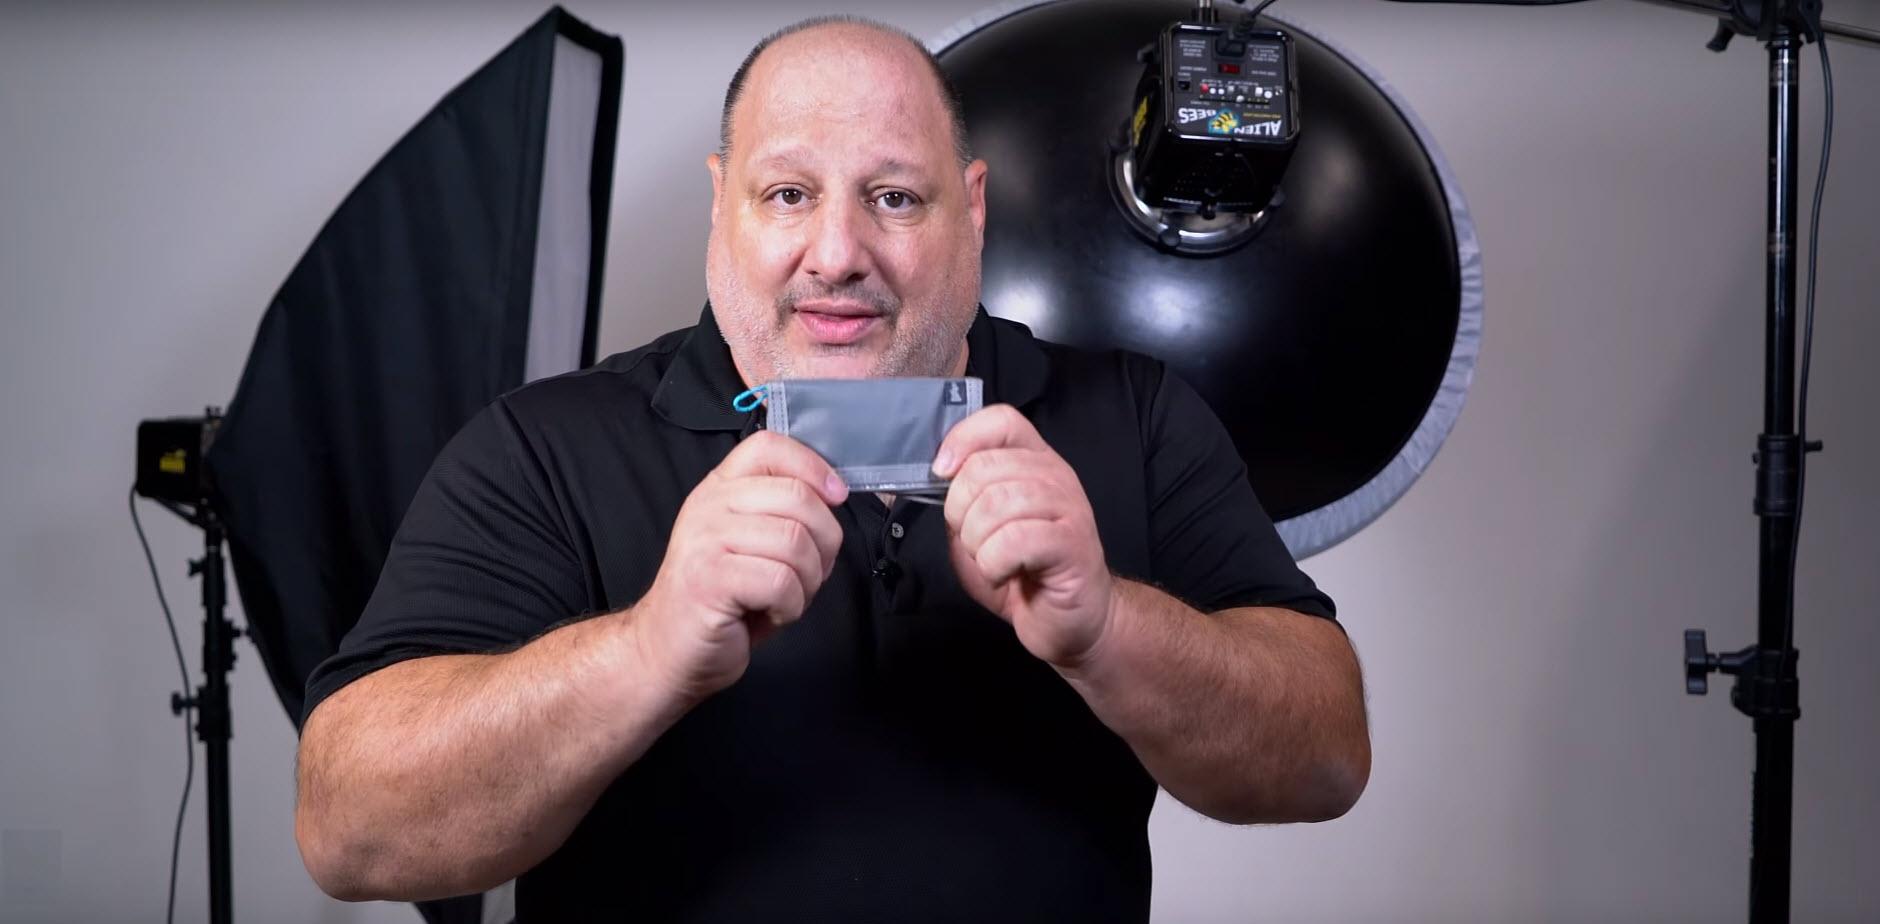 Gray Card Wallet